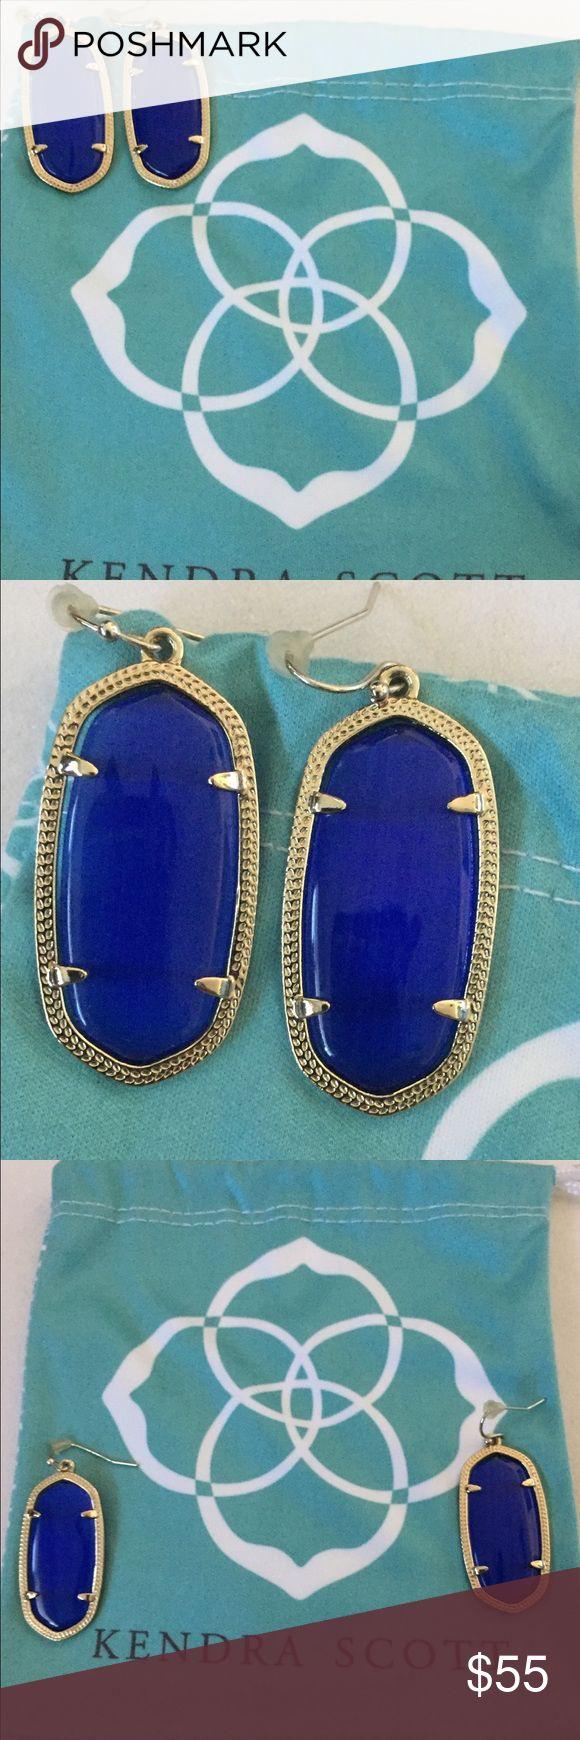 Brand New -- Cobalt Blue Kendra Scott Elle's Beautiful Cobalt Blue -- Kendra Scott -- Elle Earrings -- No Returns -- Make An Offer Kendra Scott Jewelry Earrings